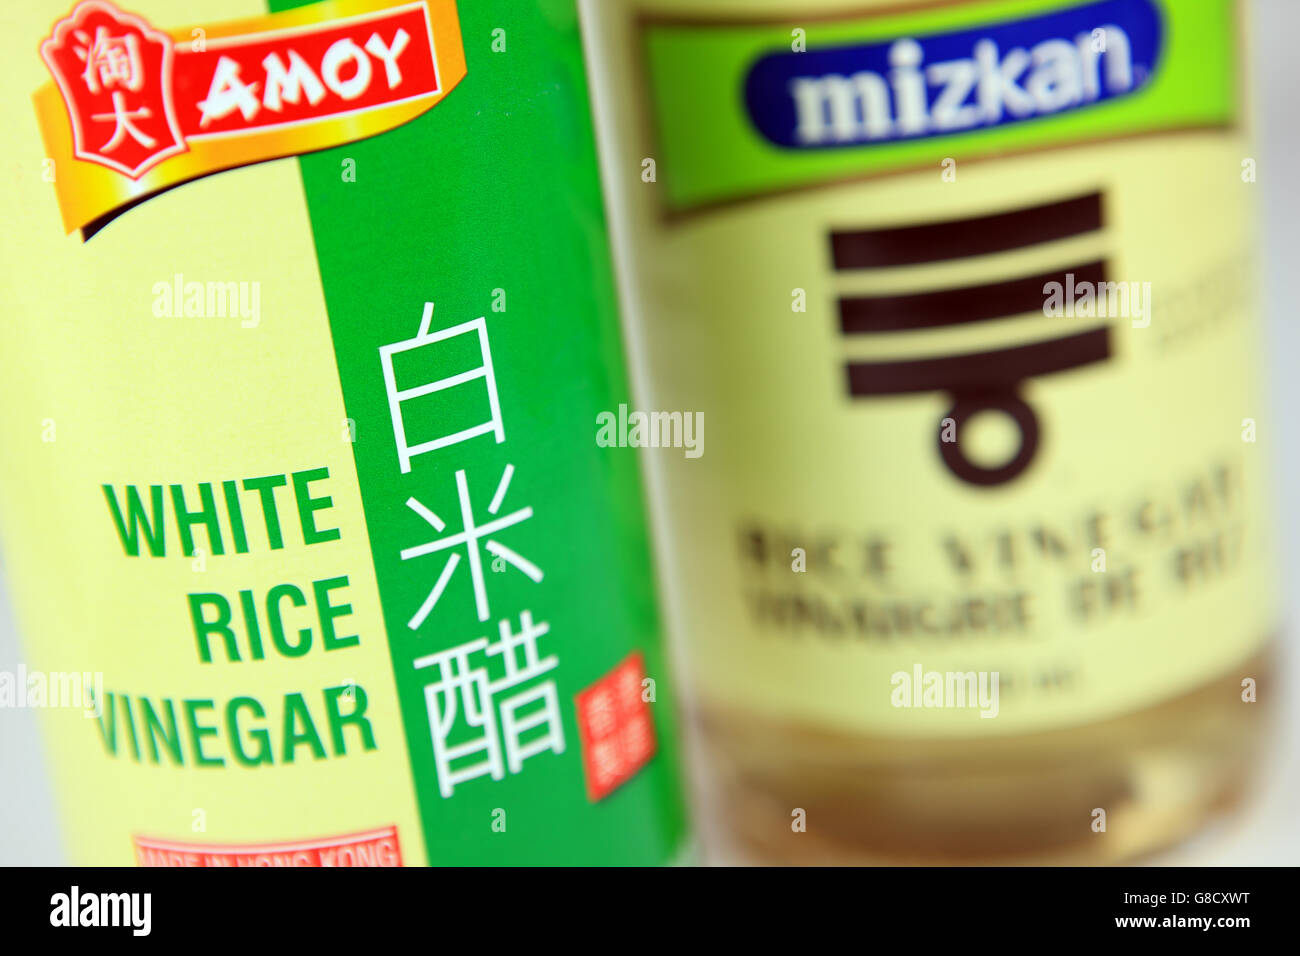 Bottles of Chinese and Japanese White Rice Vinegar - Stock Image